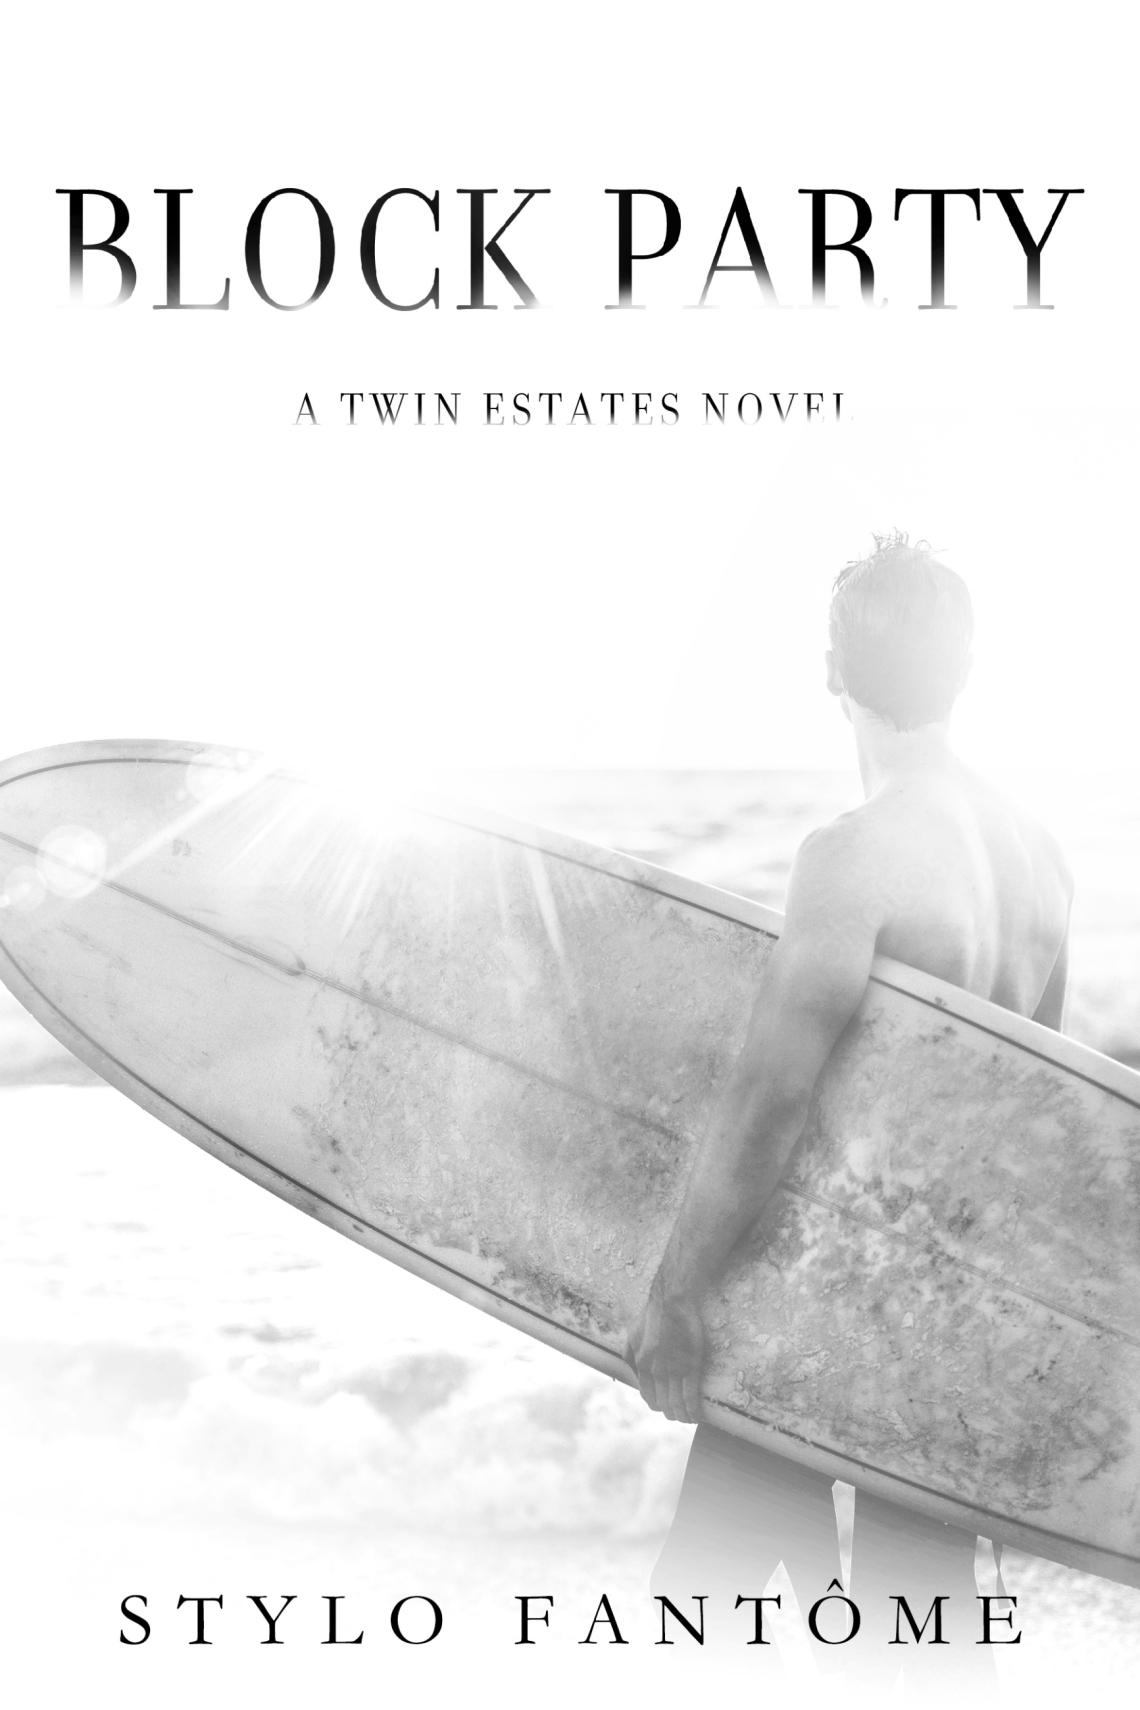 Block Party Ebook Cover